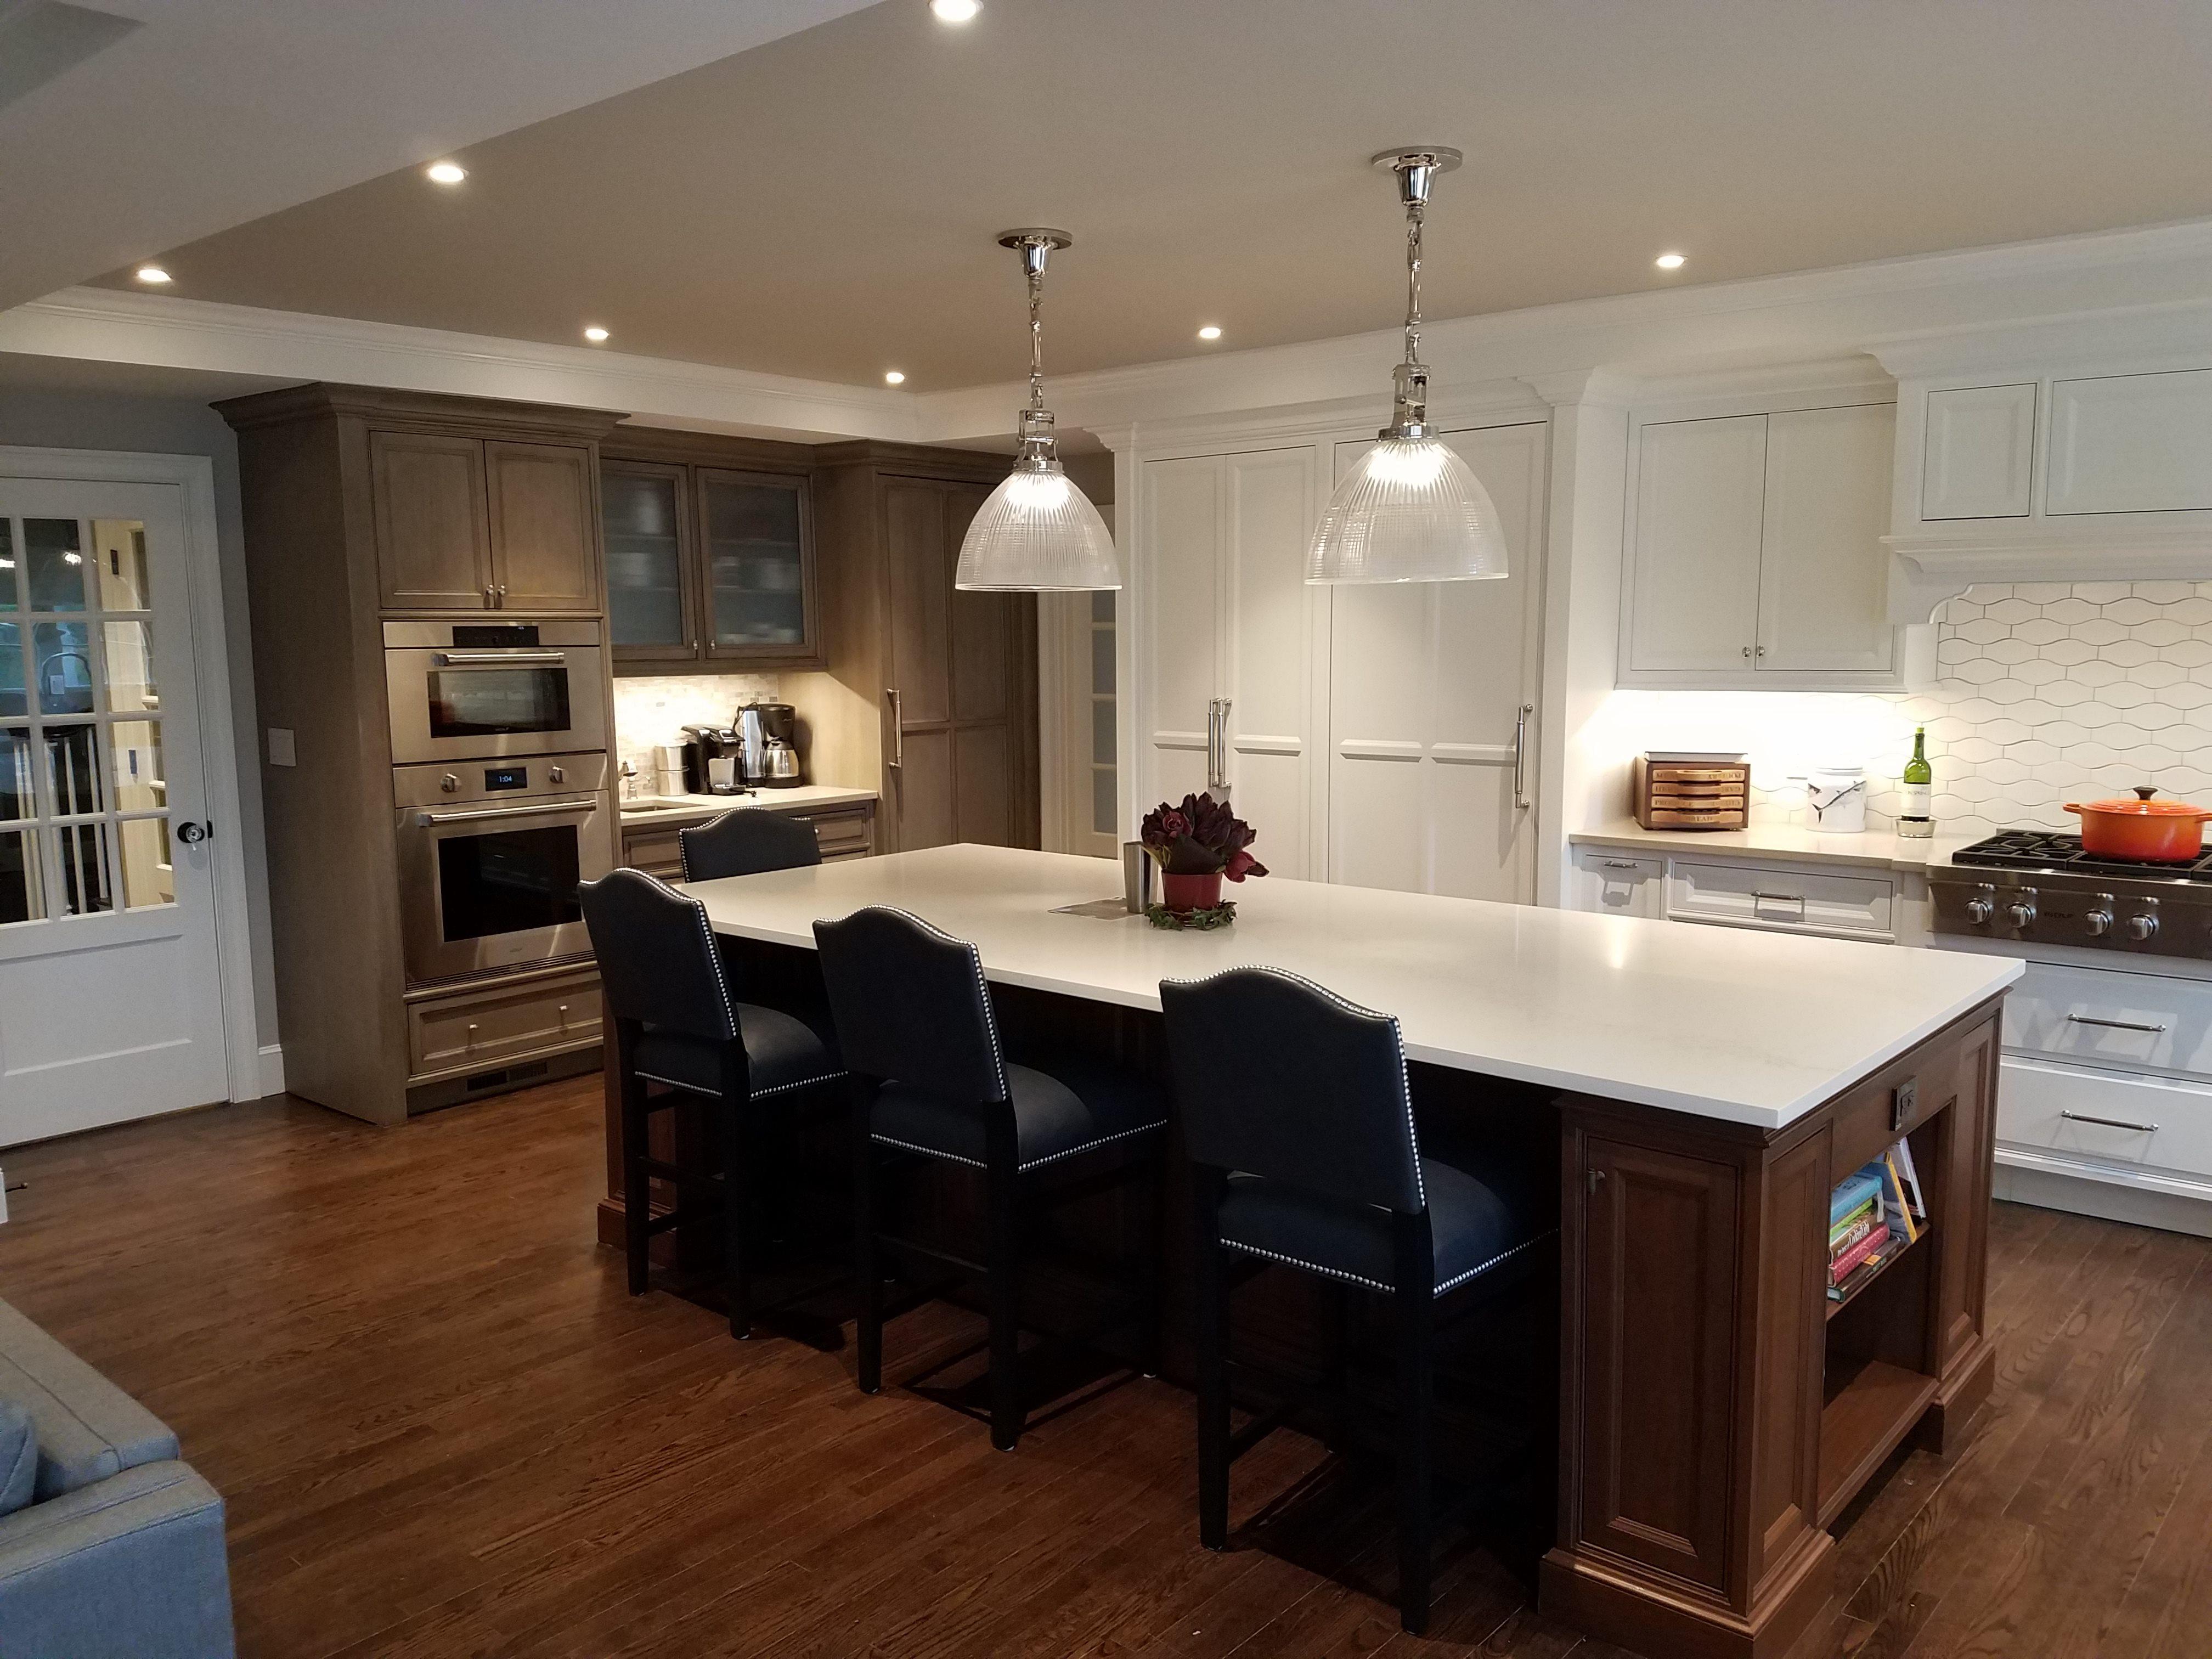 progress-contracting-kitchen-build-franklin-massachusetts